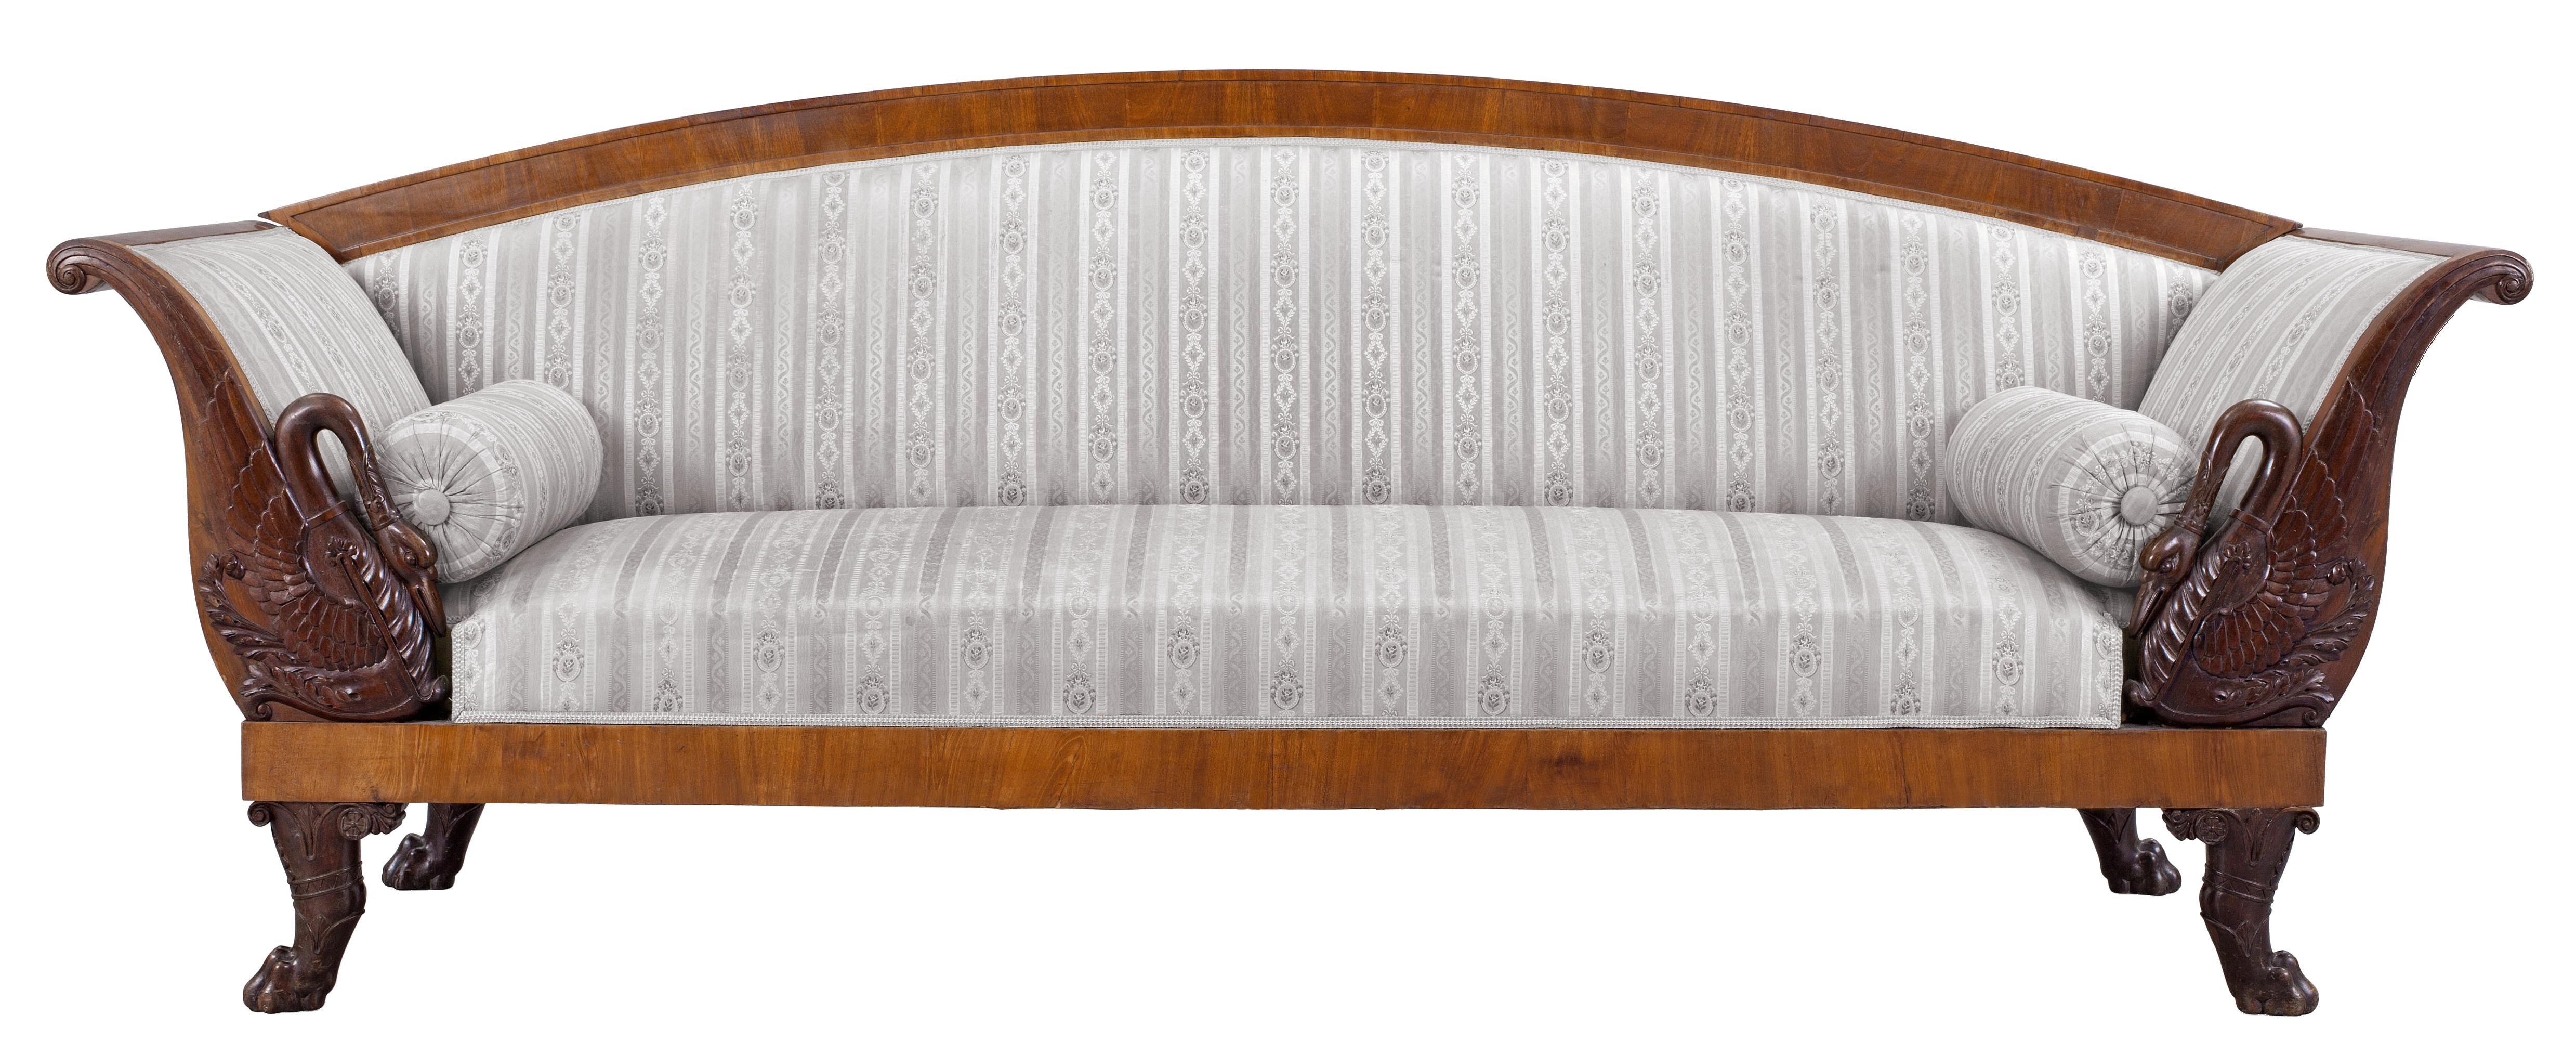 Transparent Vintage Couch PNG Picture.